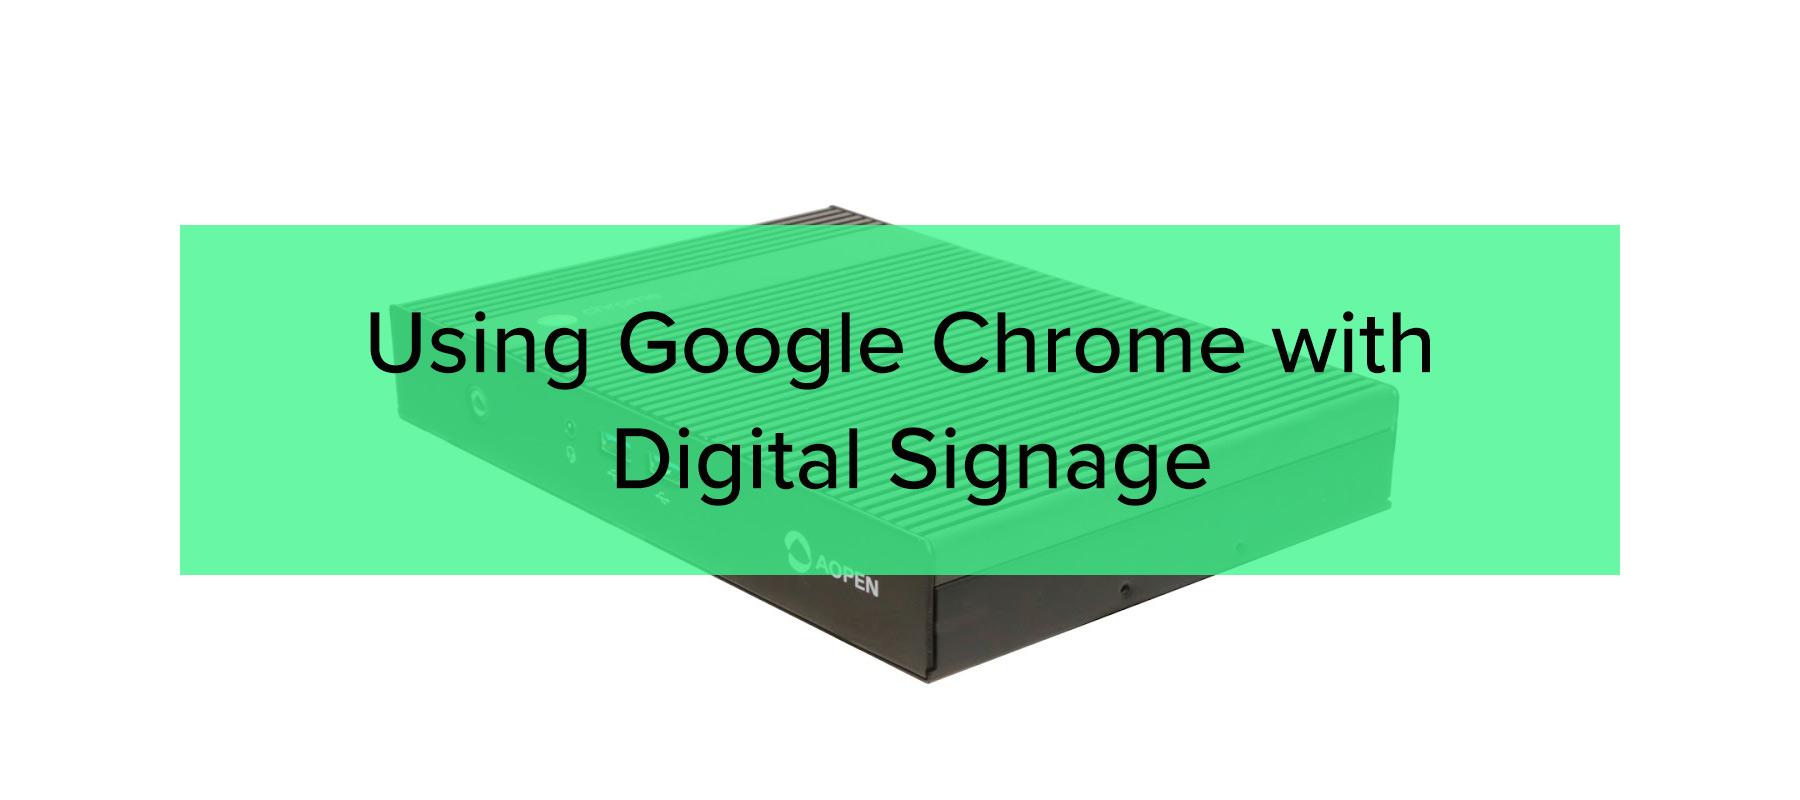 using-google-chrome-with-digital-signage